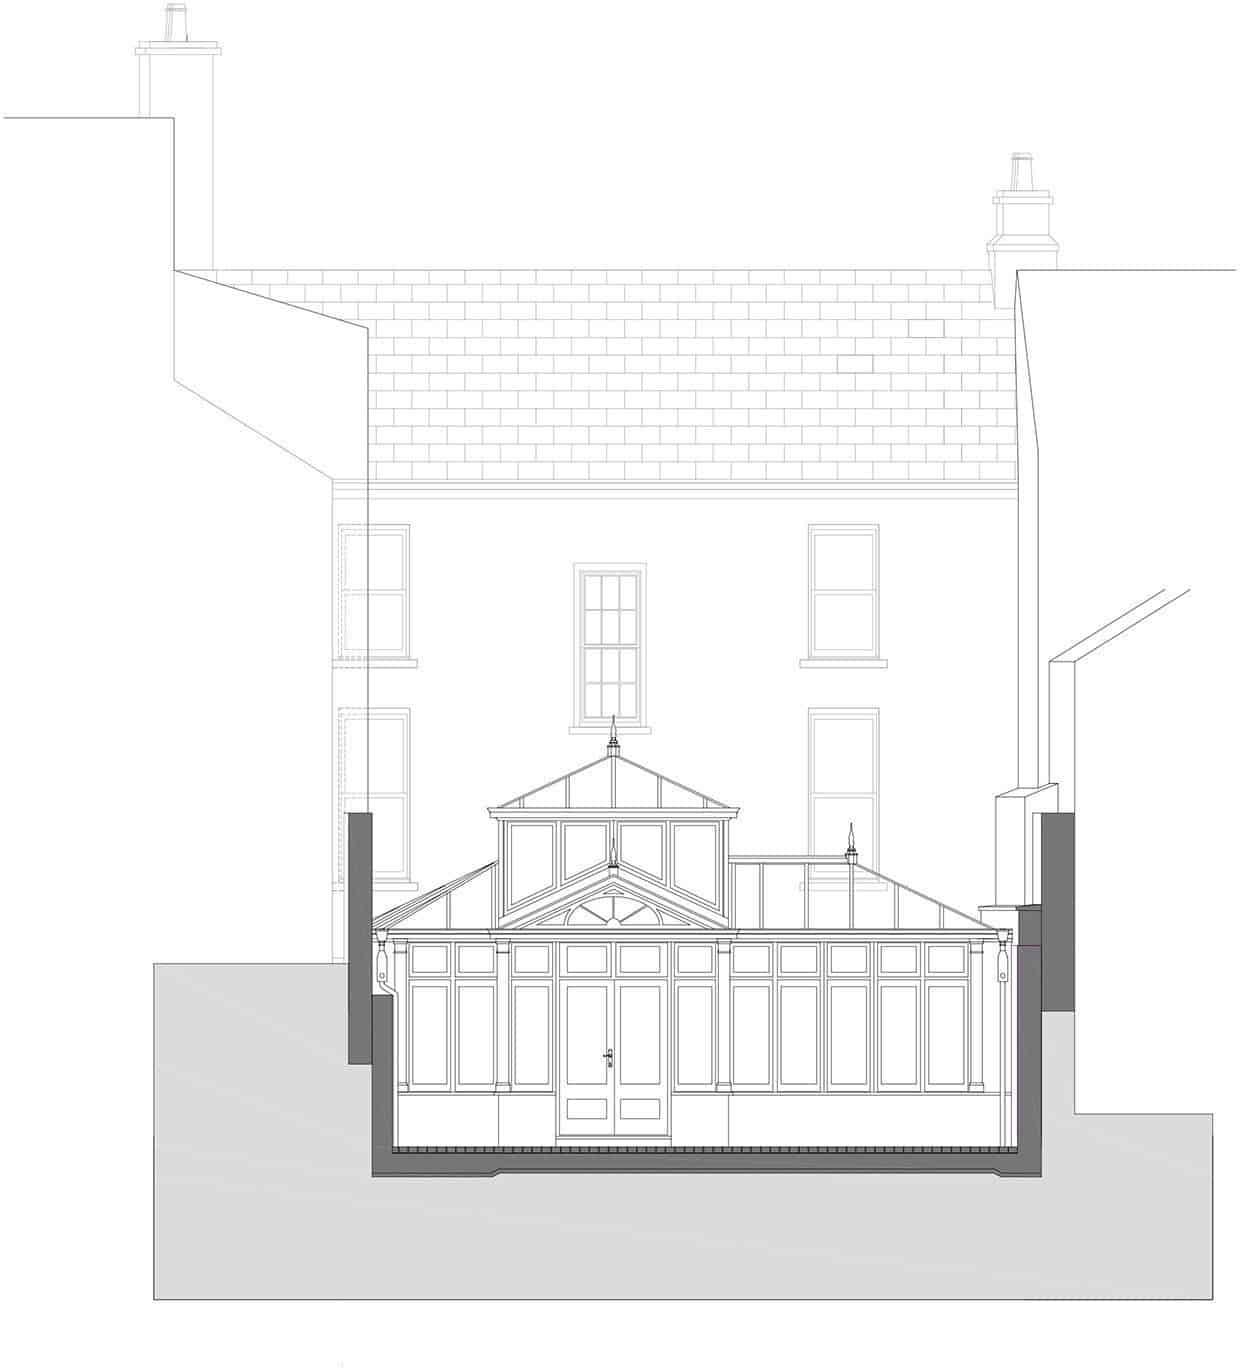 Maison de ville géorgienne-Kingston Lafferty Design-28-1 Kindesign